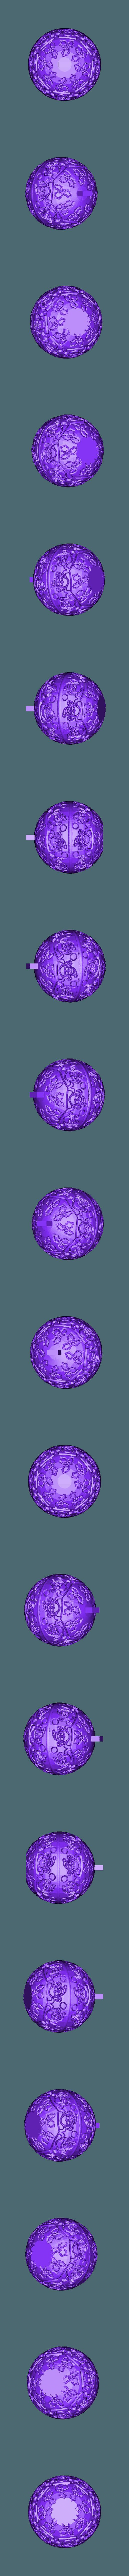 boule de noel pere noel 7.stl Download free STL file christmas ball 7 • Model to 3D print, Motek3D